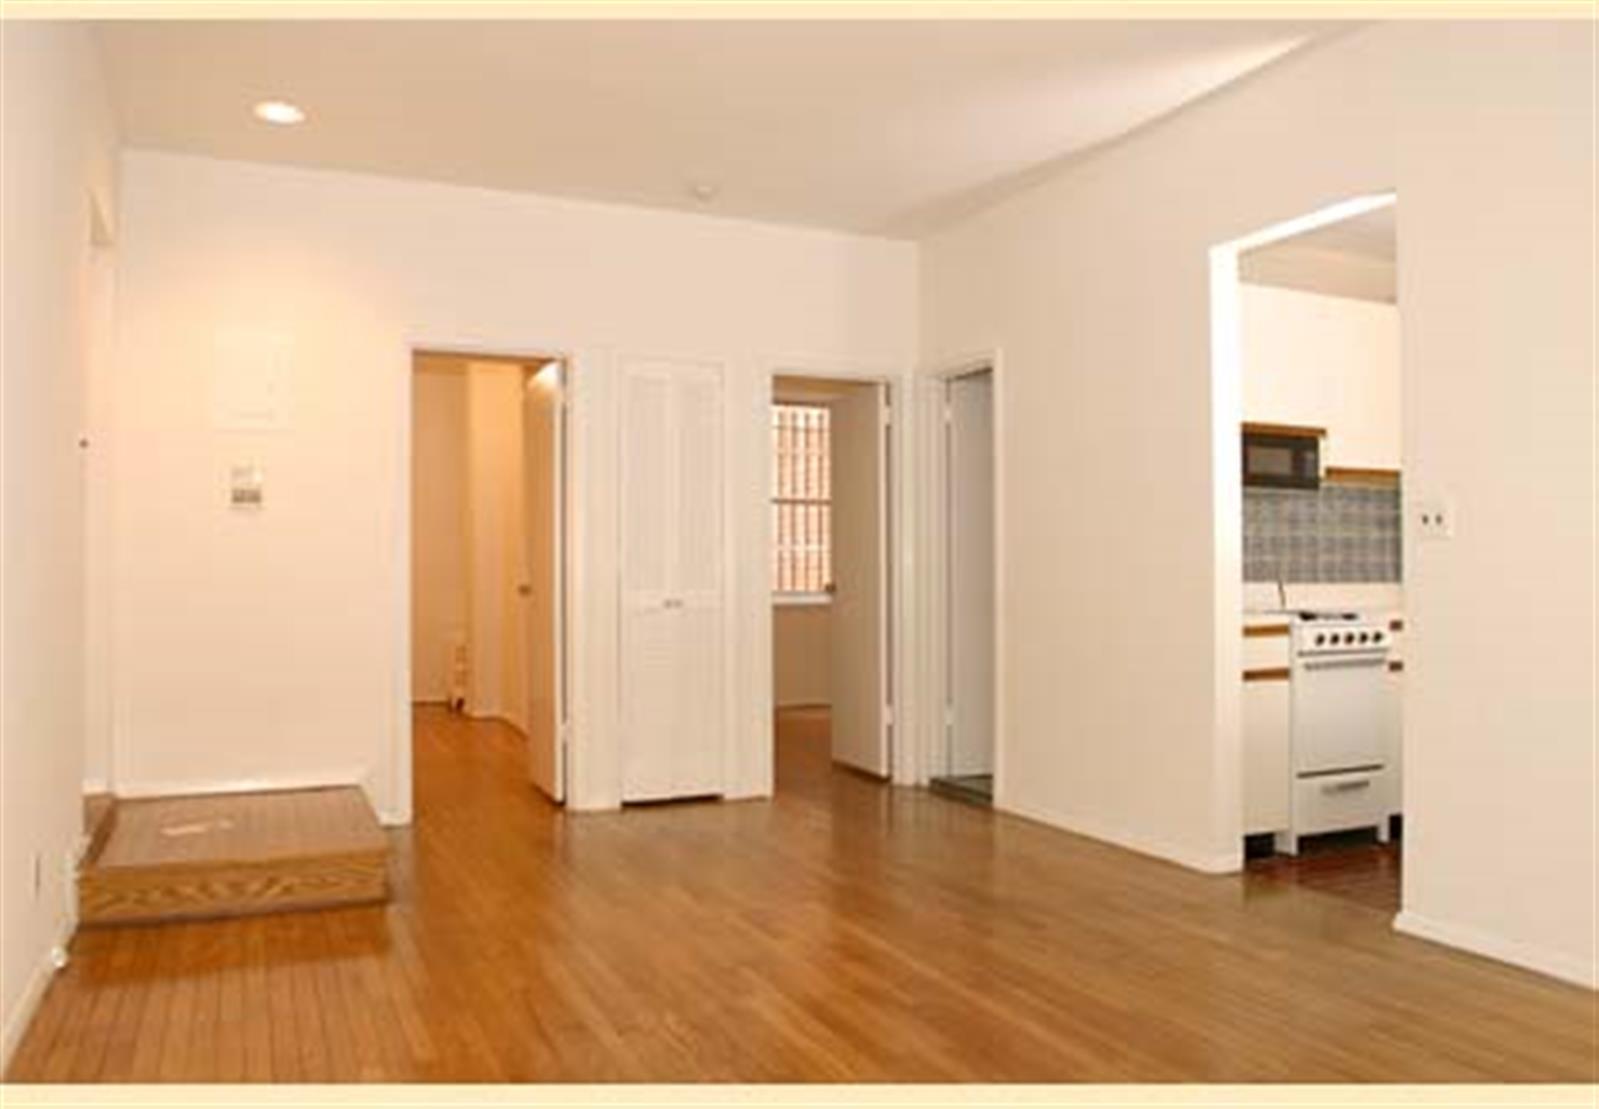 Three bedroom - Upper East Side